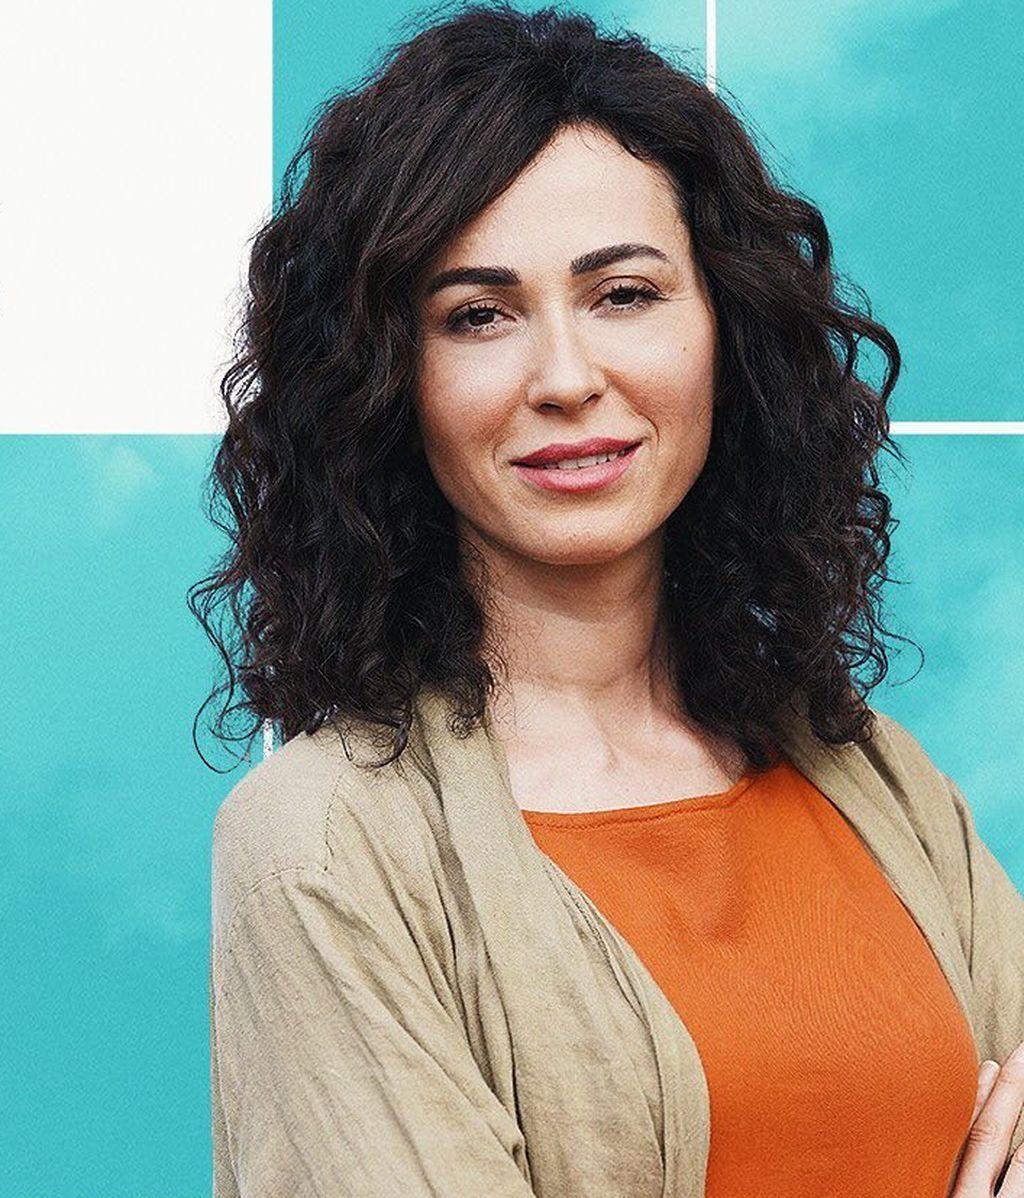 Evrim Dogan interpreta a Ayfer Yildiz